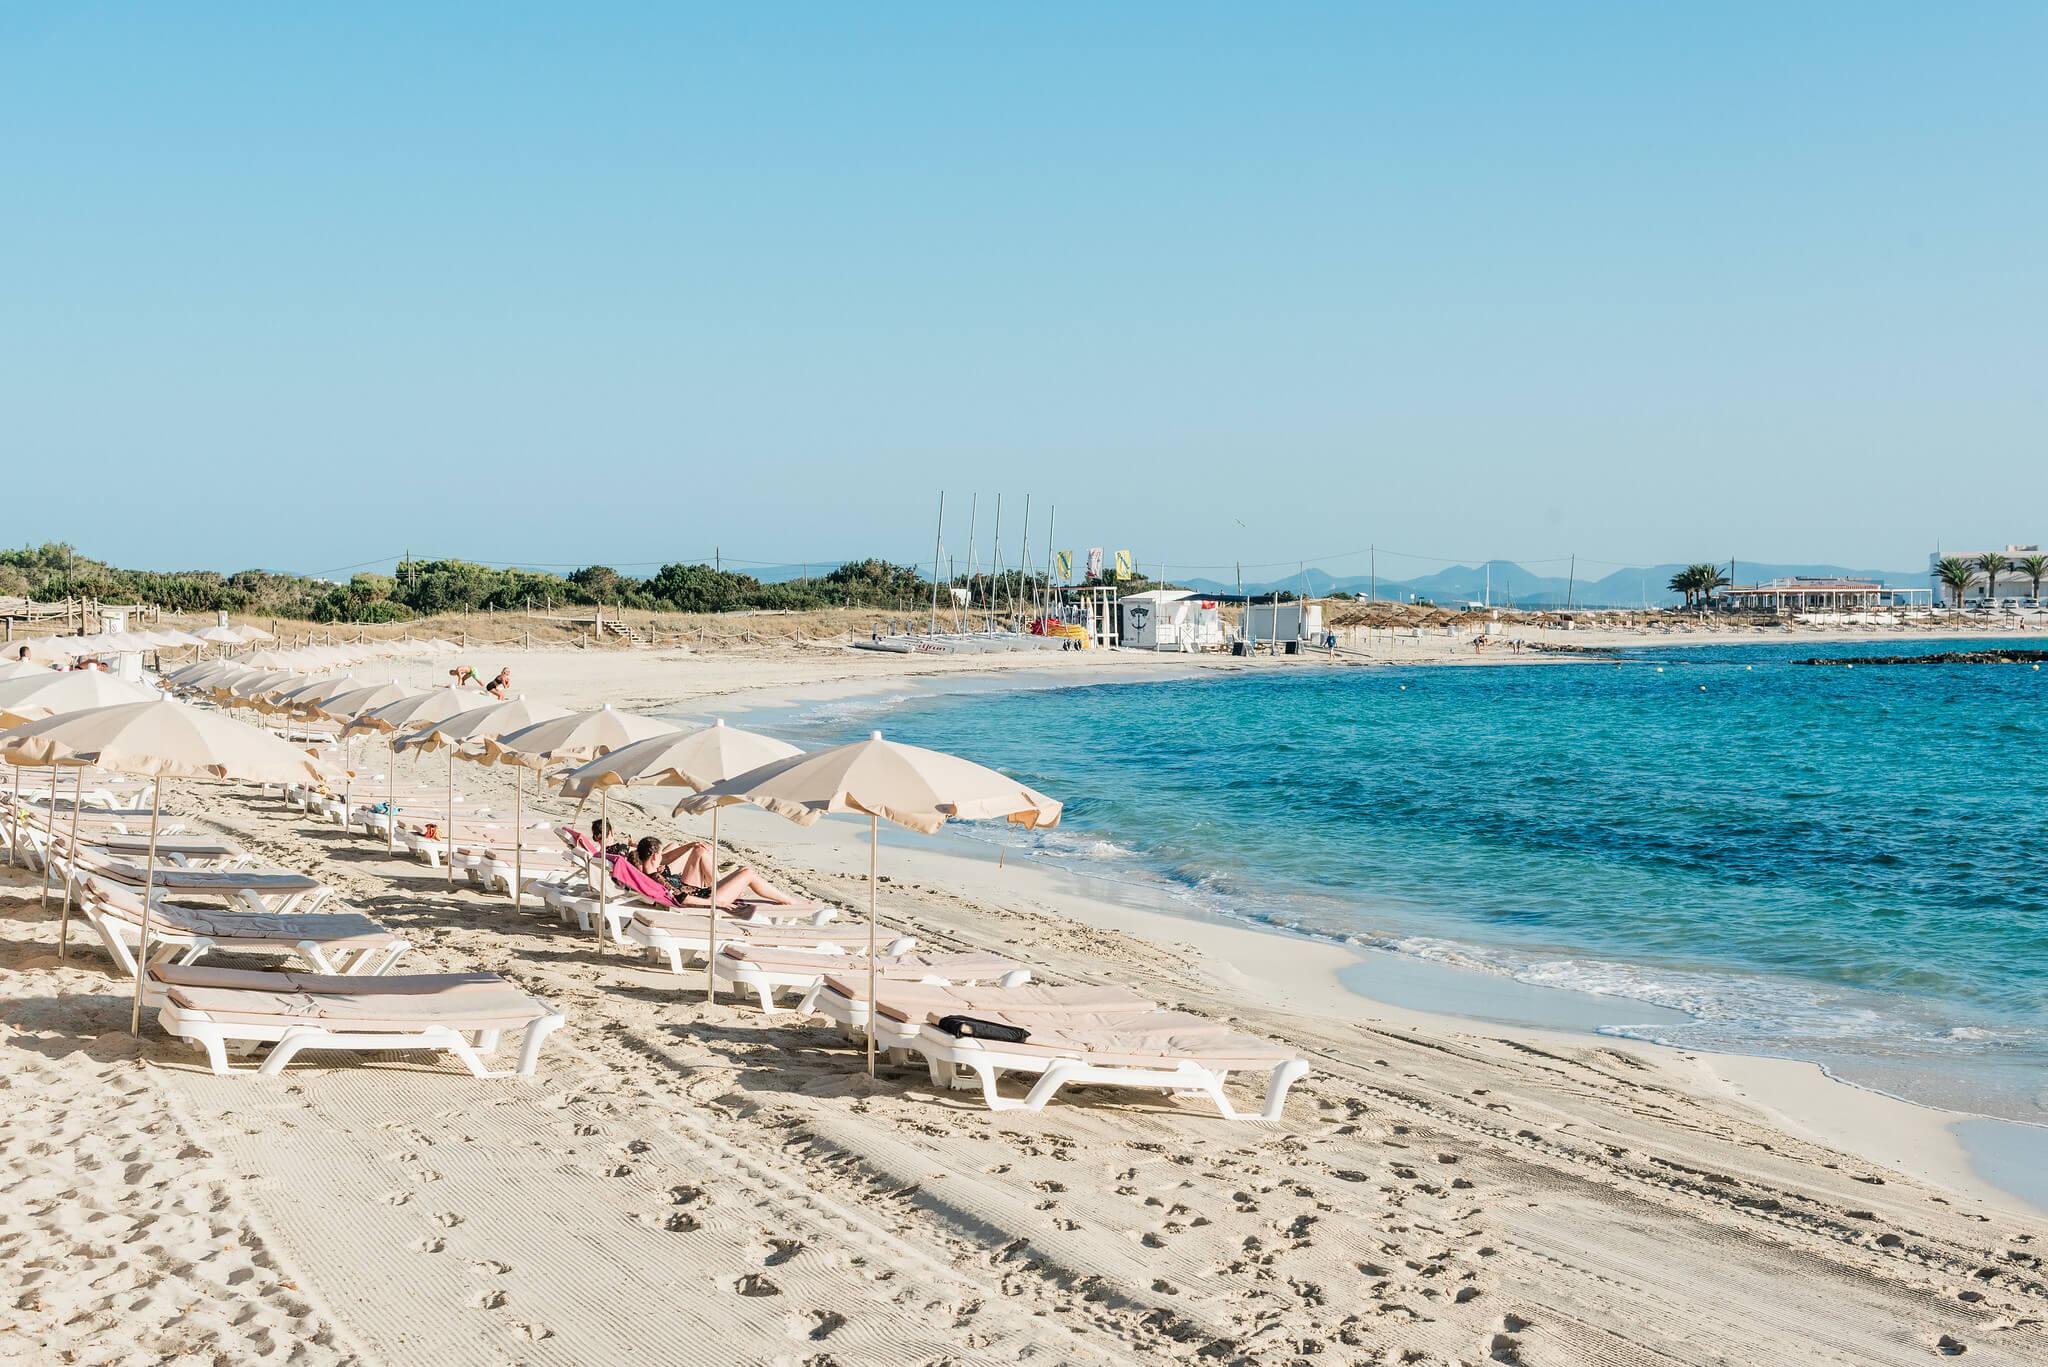 https://www.white-ibiza.com/wp-content/uploads/2020/03/formentera-beaches-es-pujols-2020-01.jpg